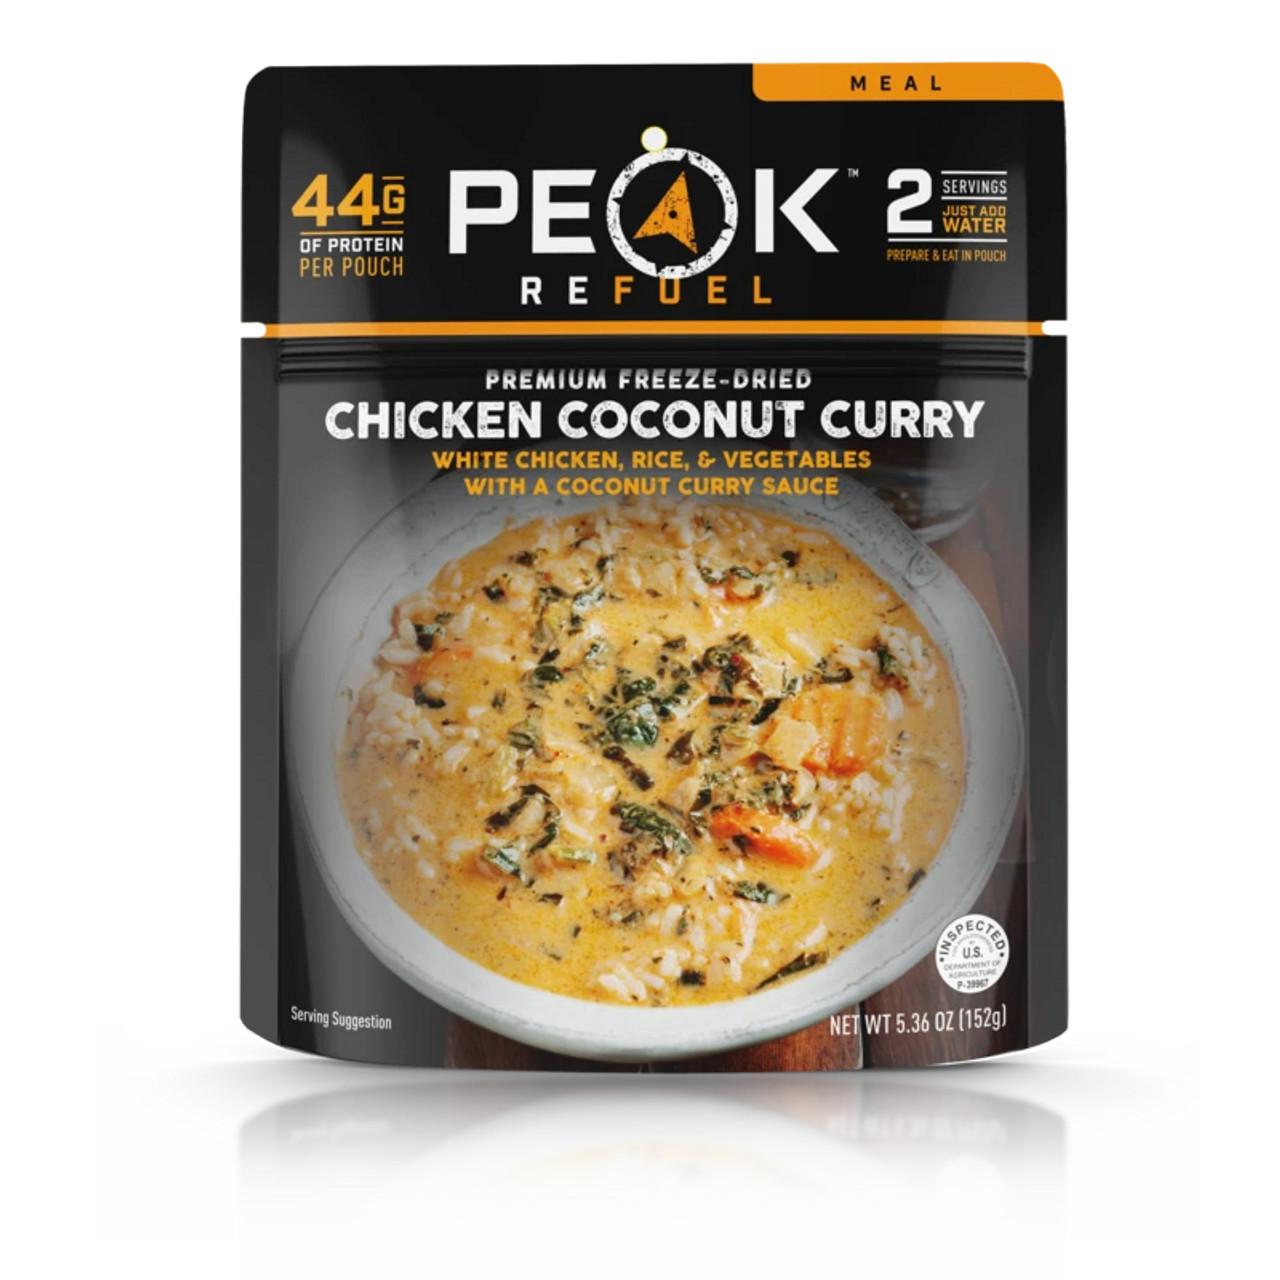 Peak Refuel Chicken Coconut Curry